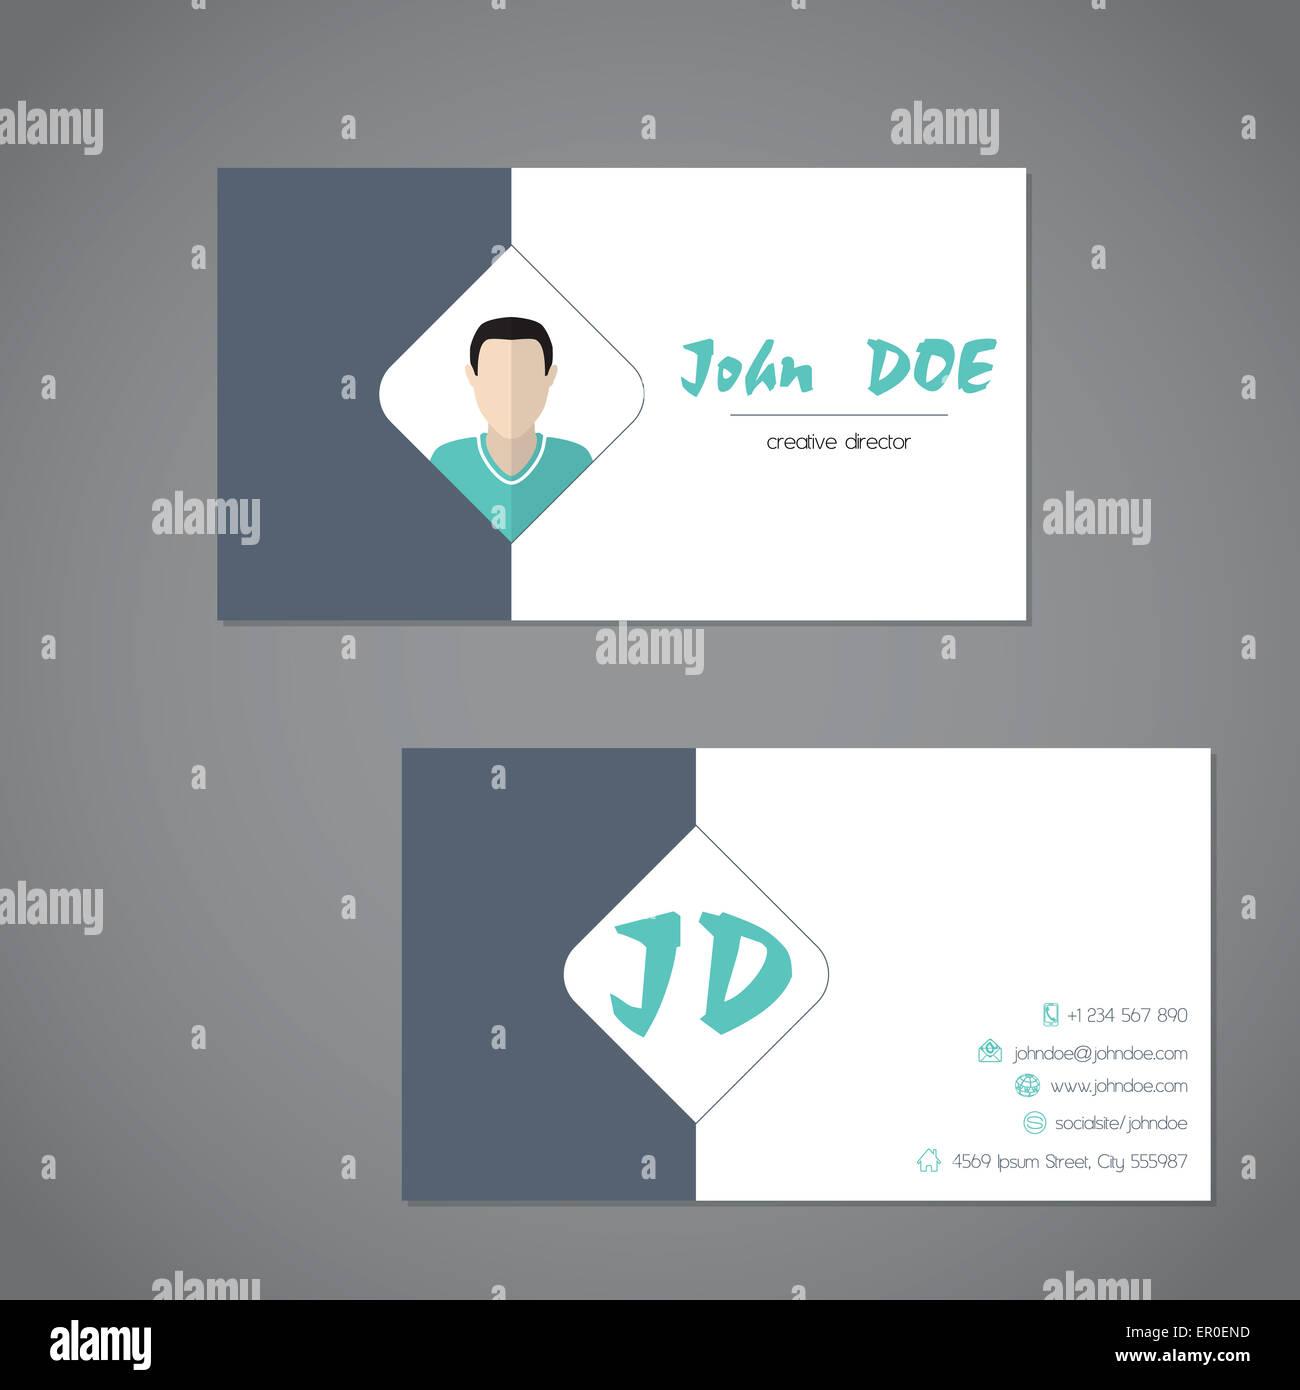 Business Card Design Simplistic Presentation Stock Photos & Business ...